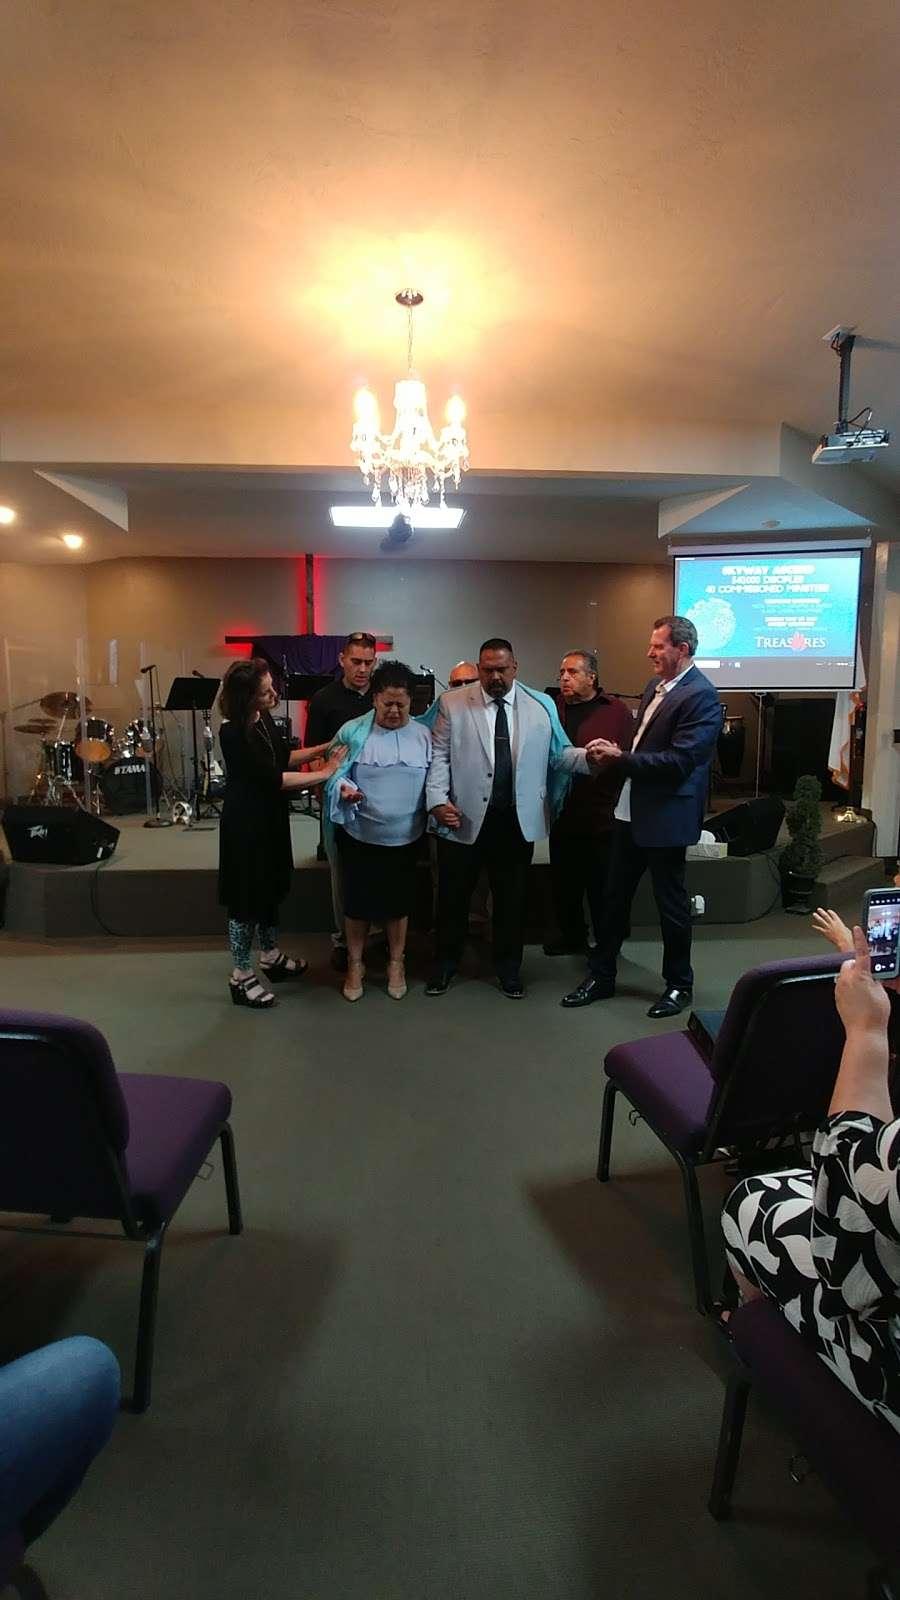 Treasures out of Darkness Ministry - church  | Photo 7 of 10 | Address: 5402 S Montezuma St, Phoenix, AZ 85041, USA | Phone: (623) 363-4326